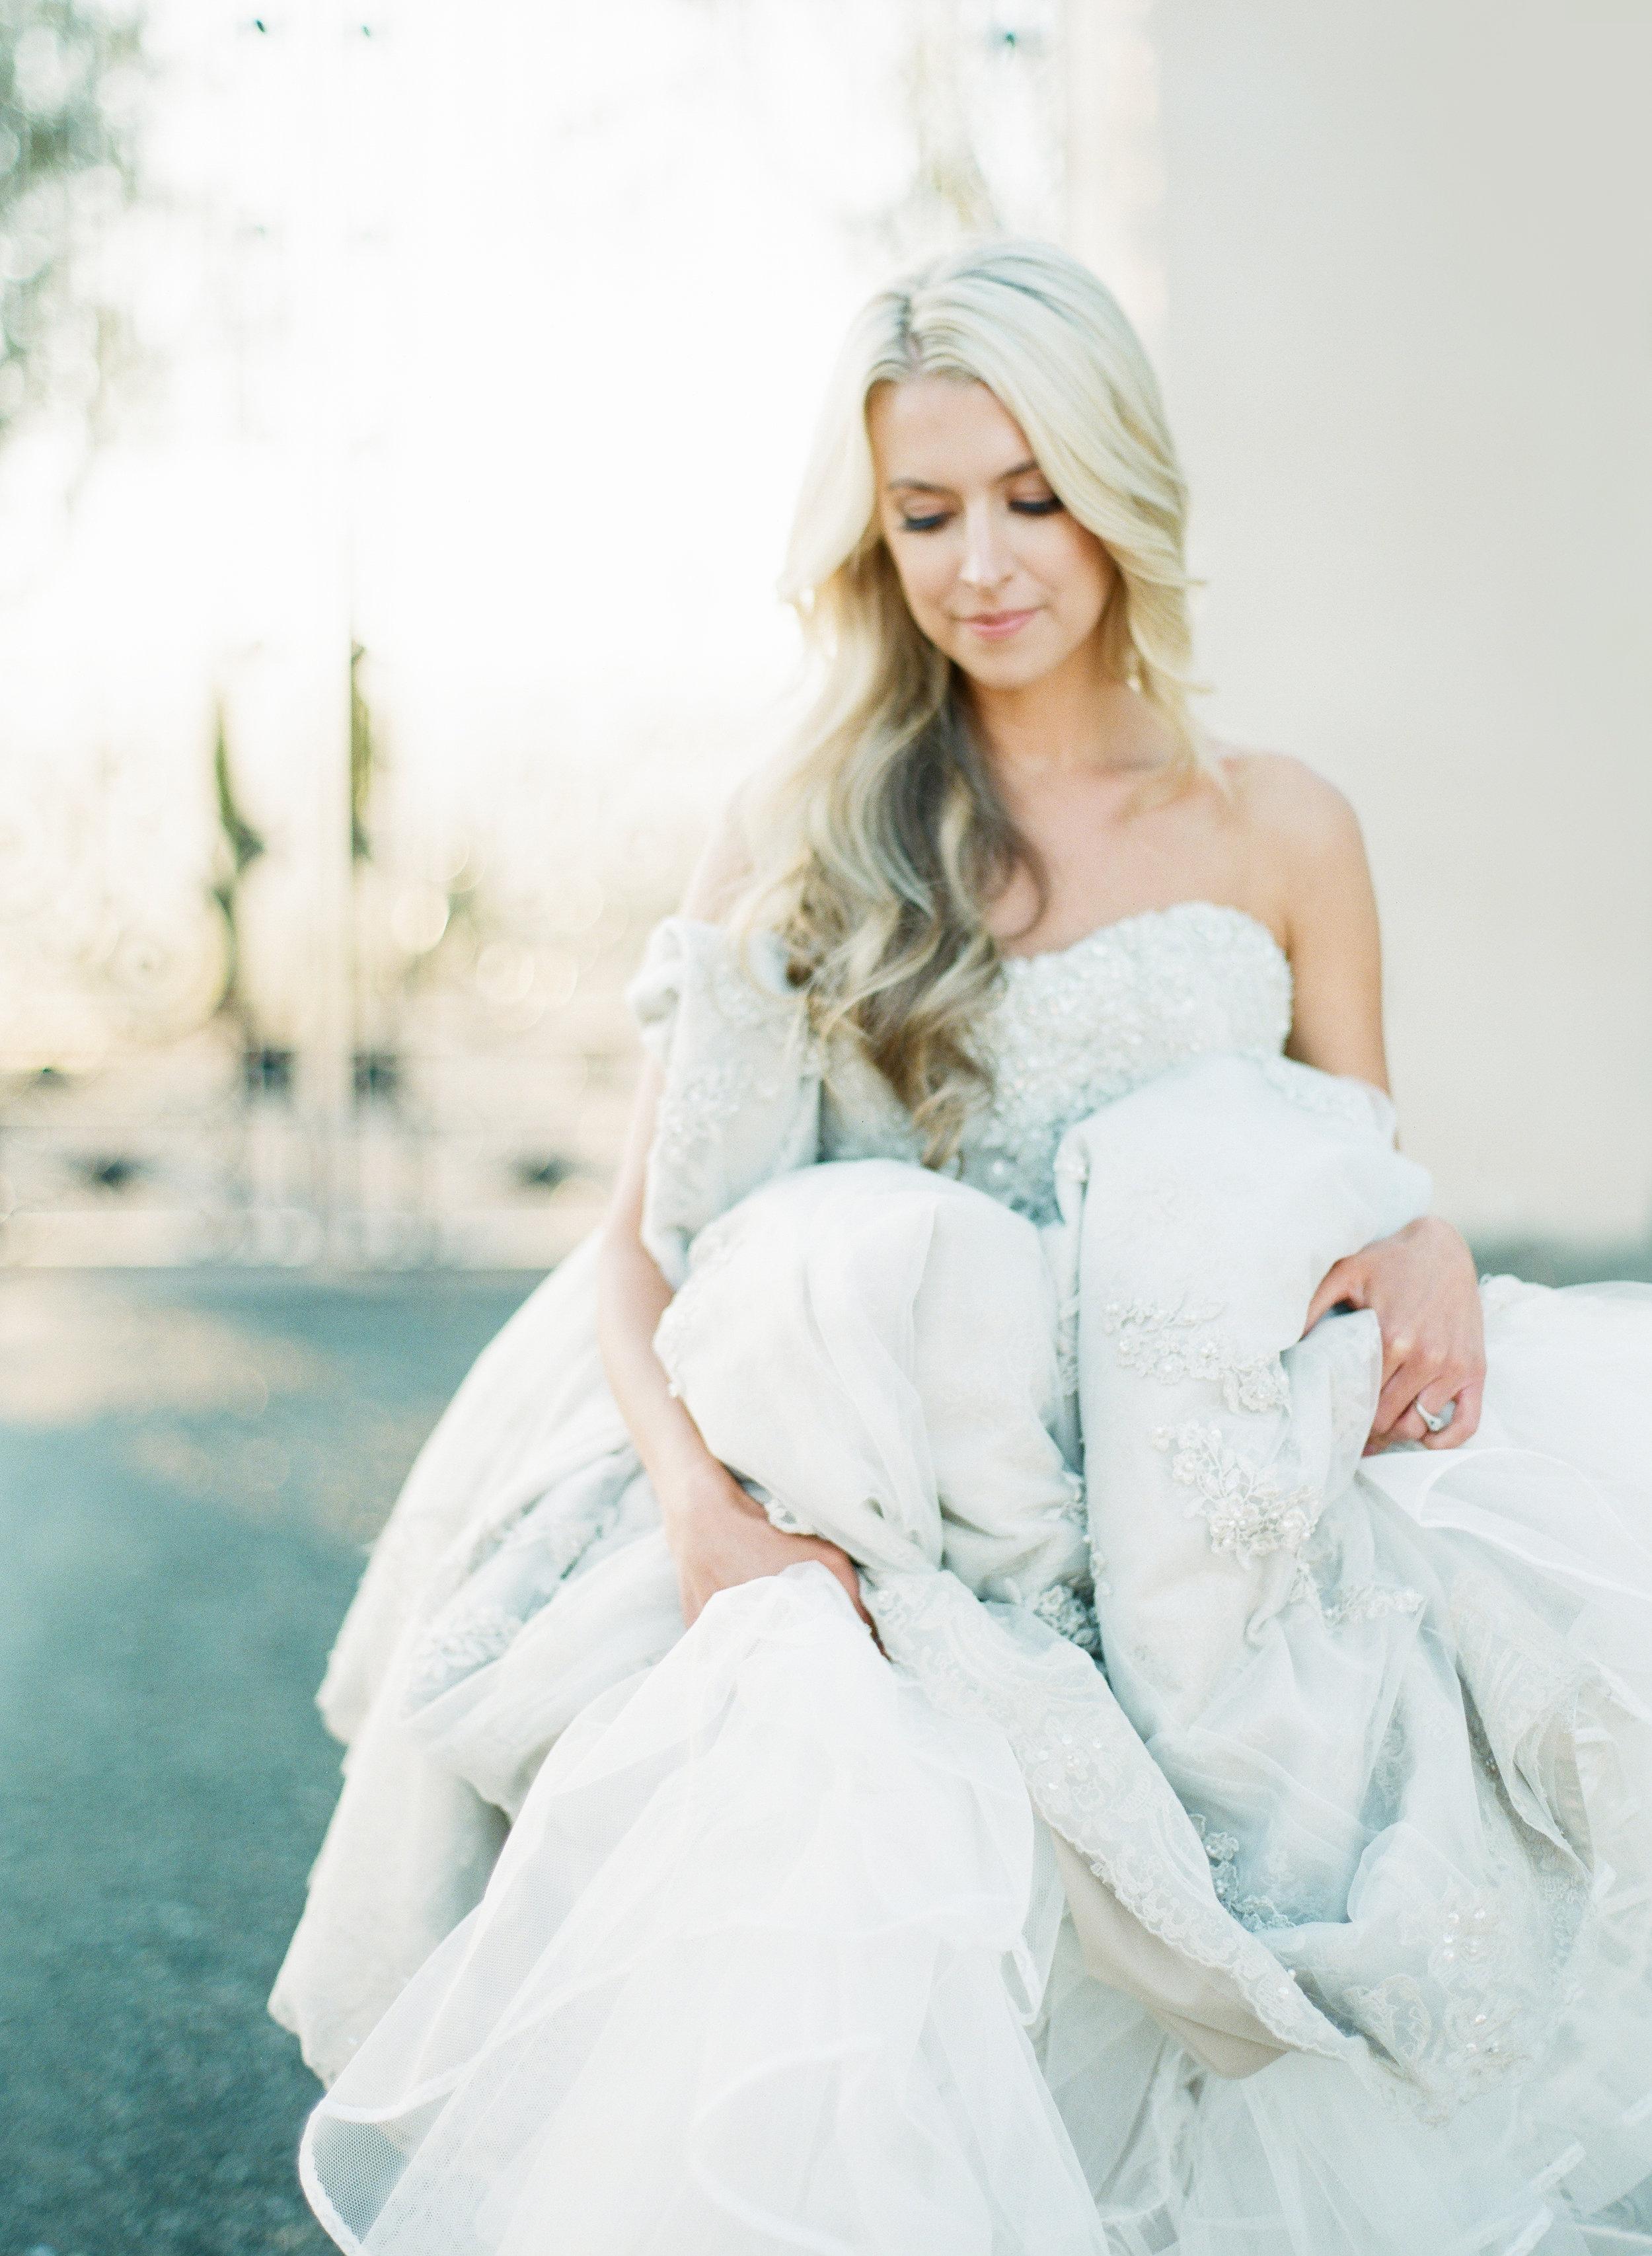 janetvilla.com | Janet Villa Hair and Makeup | Southern California Beauty Expert and Salon | Meg Fish Photo